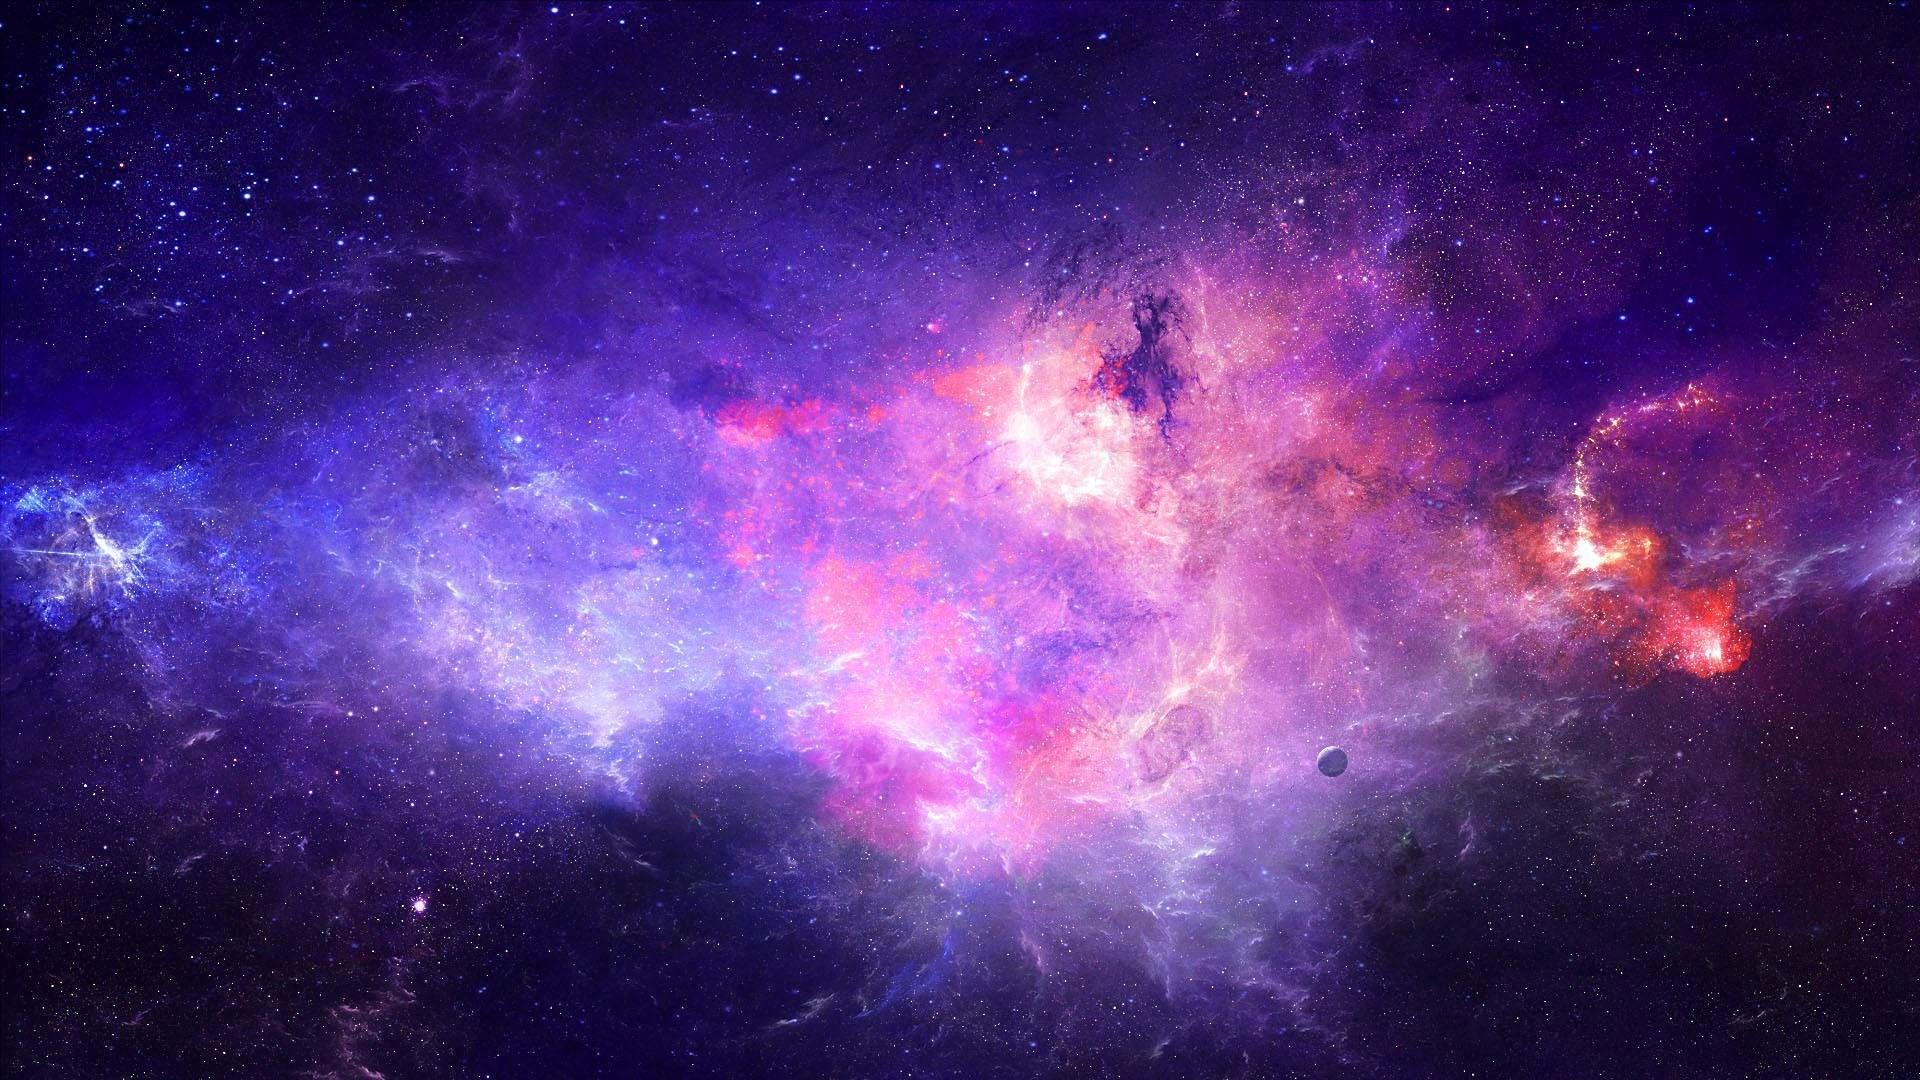 1920x1080px-space-hd-by-Nita-Round-wallpaper-wp360946